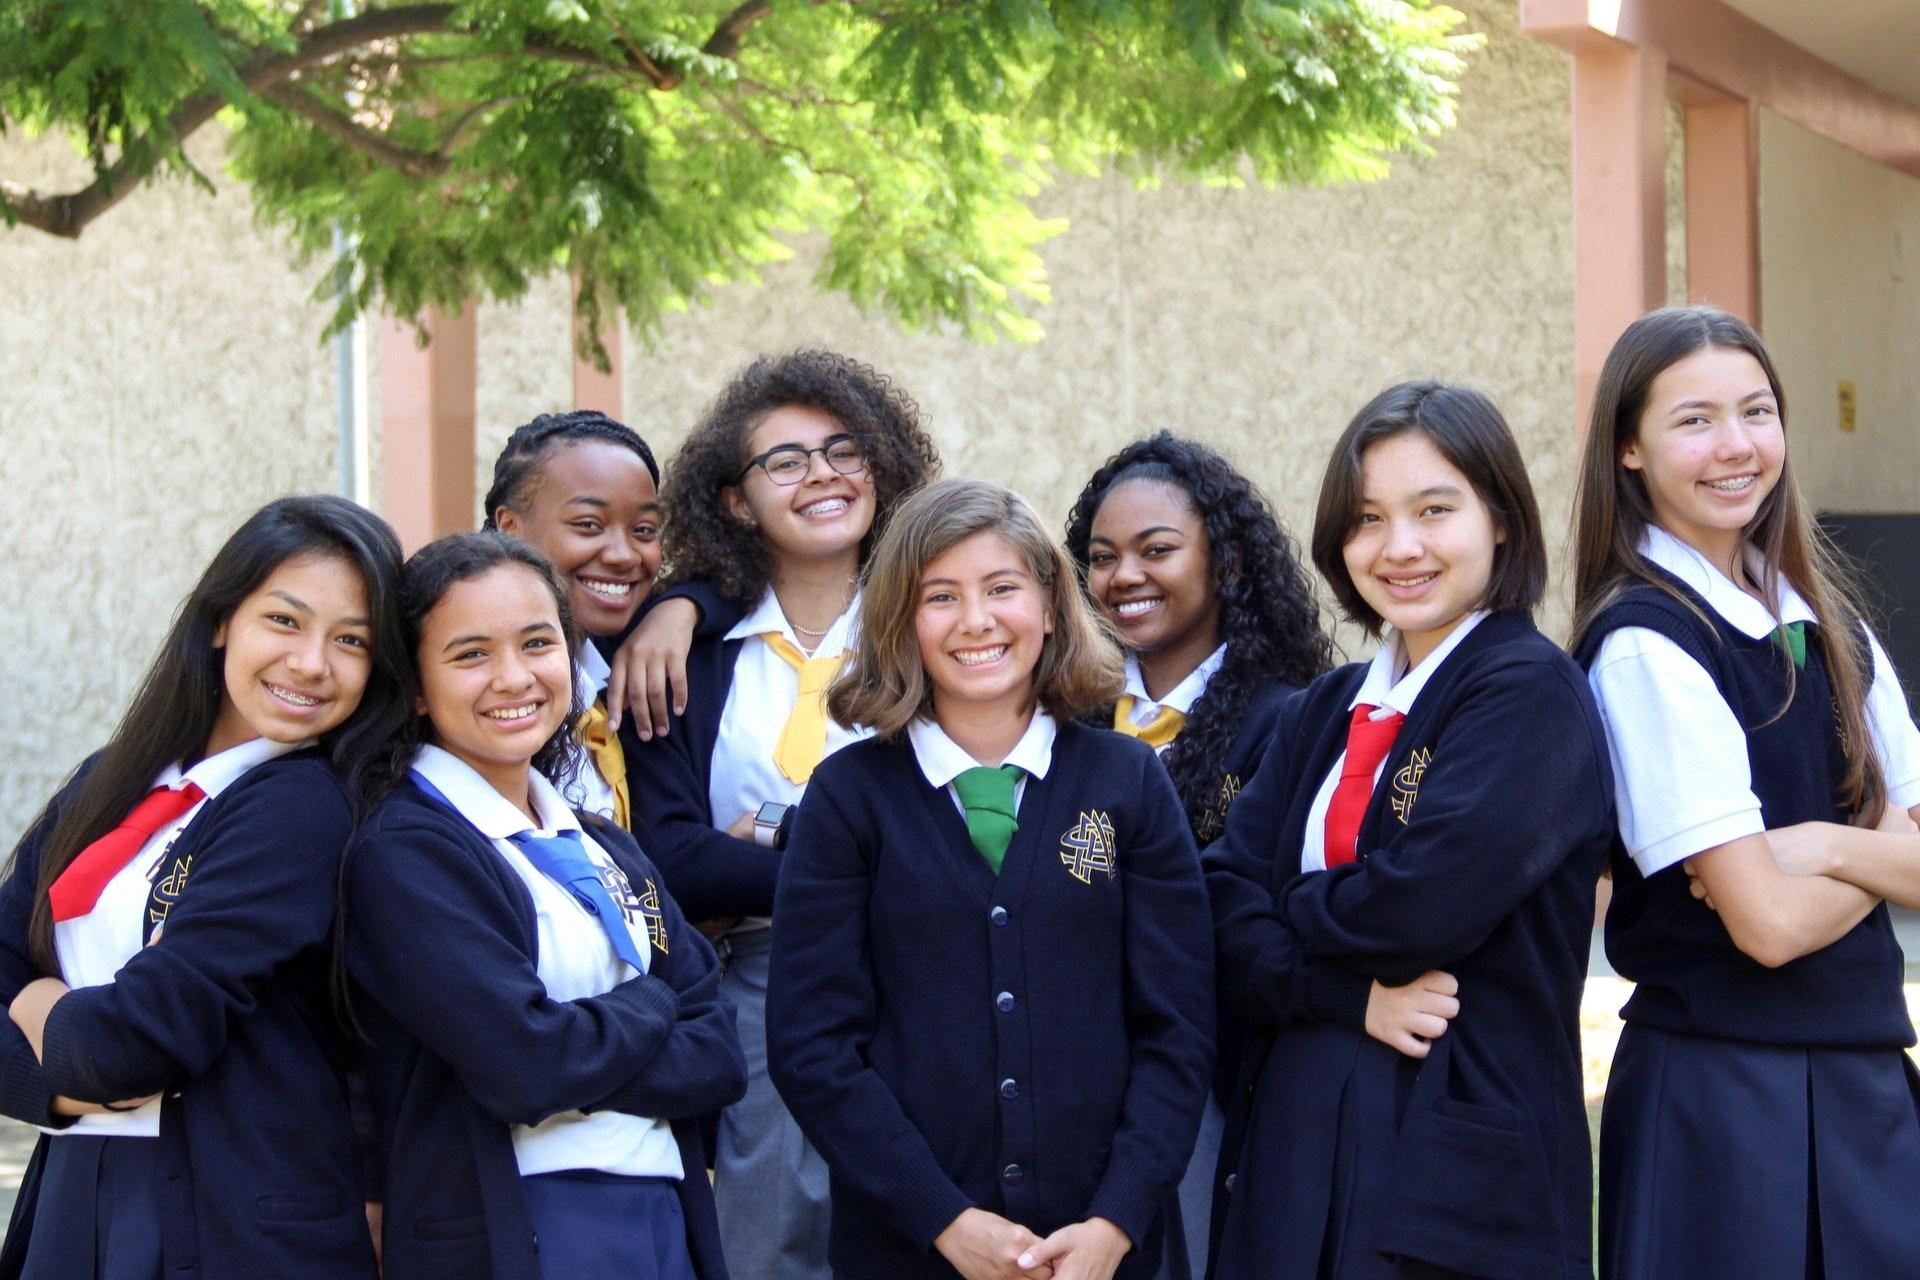 Onward Scholars group photo